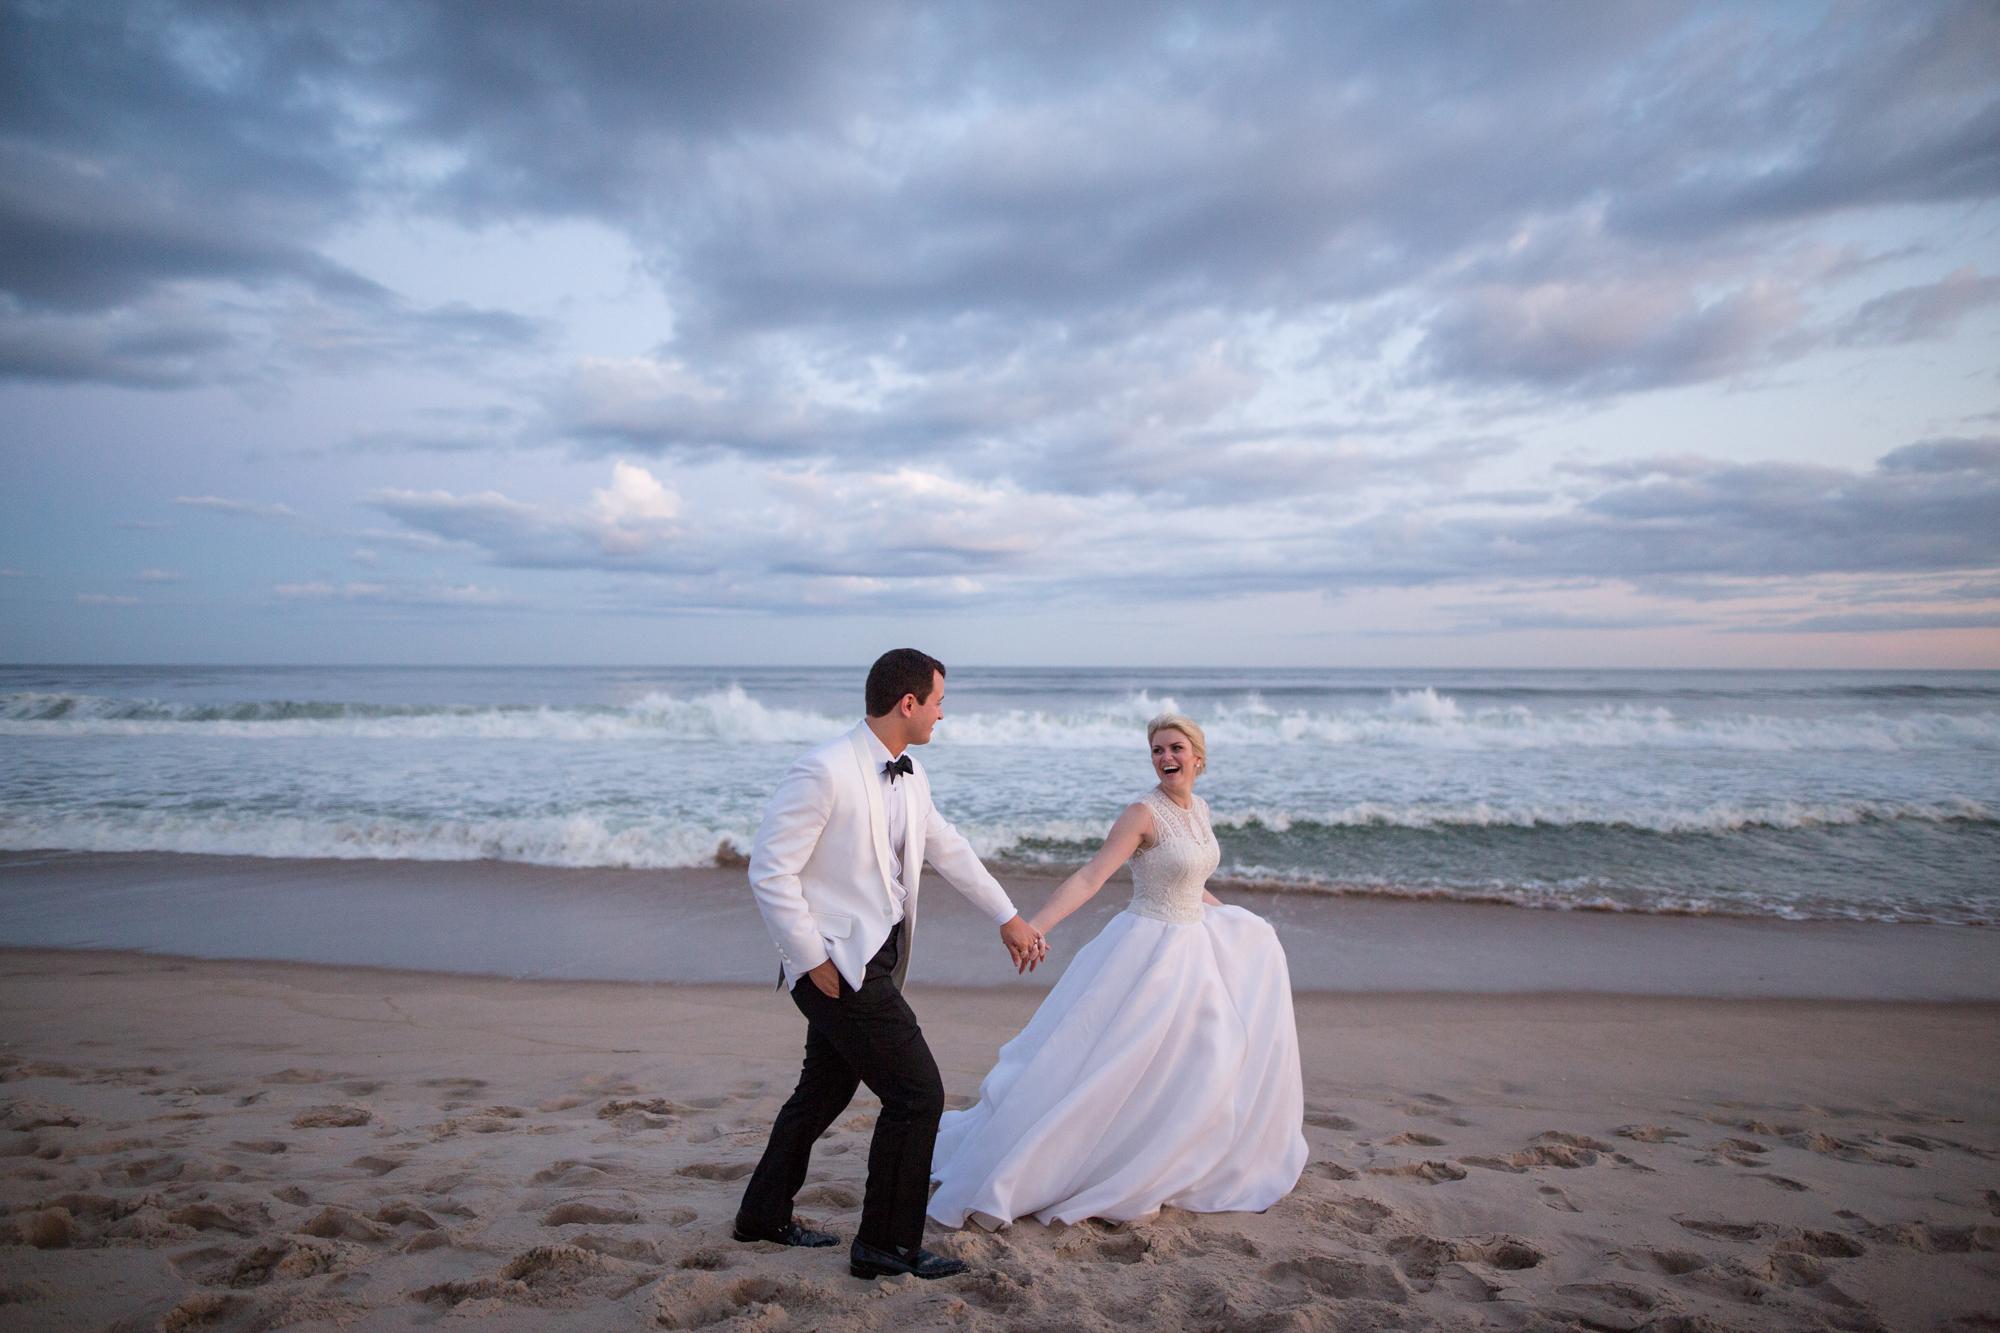 vancouver-luxury-wedding-photographer-lori-miles-1054.jpg